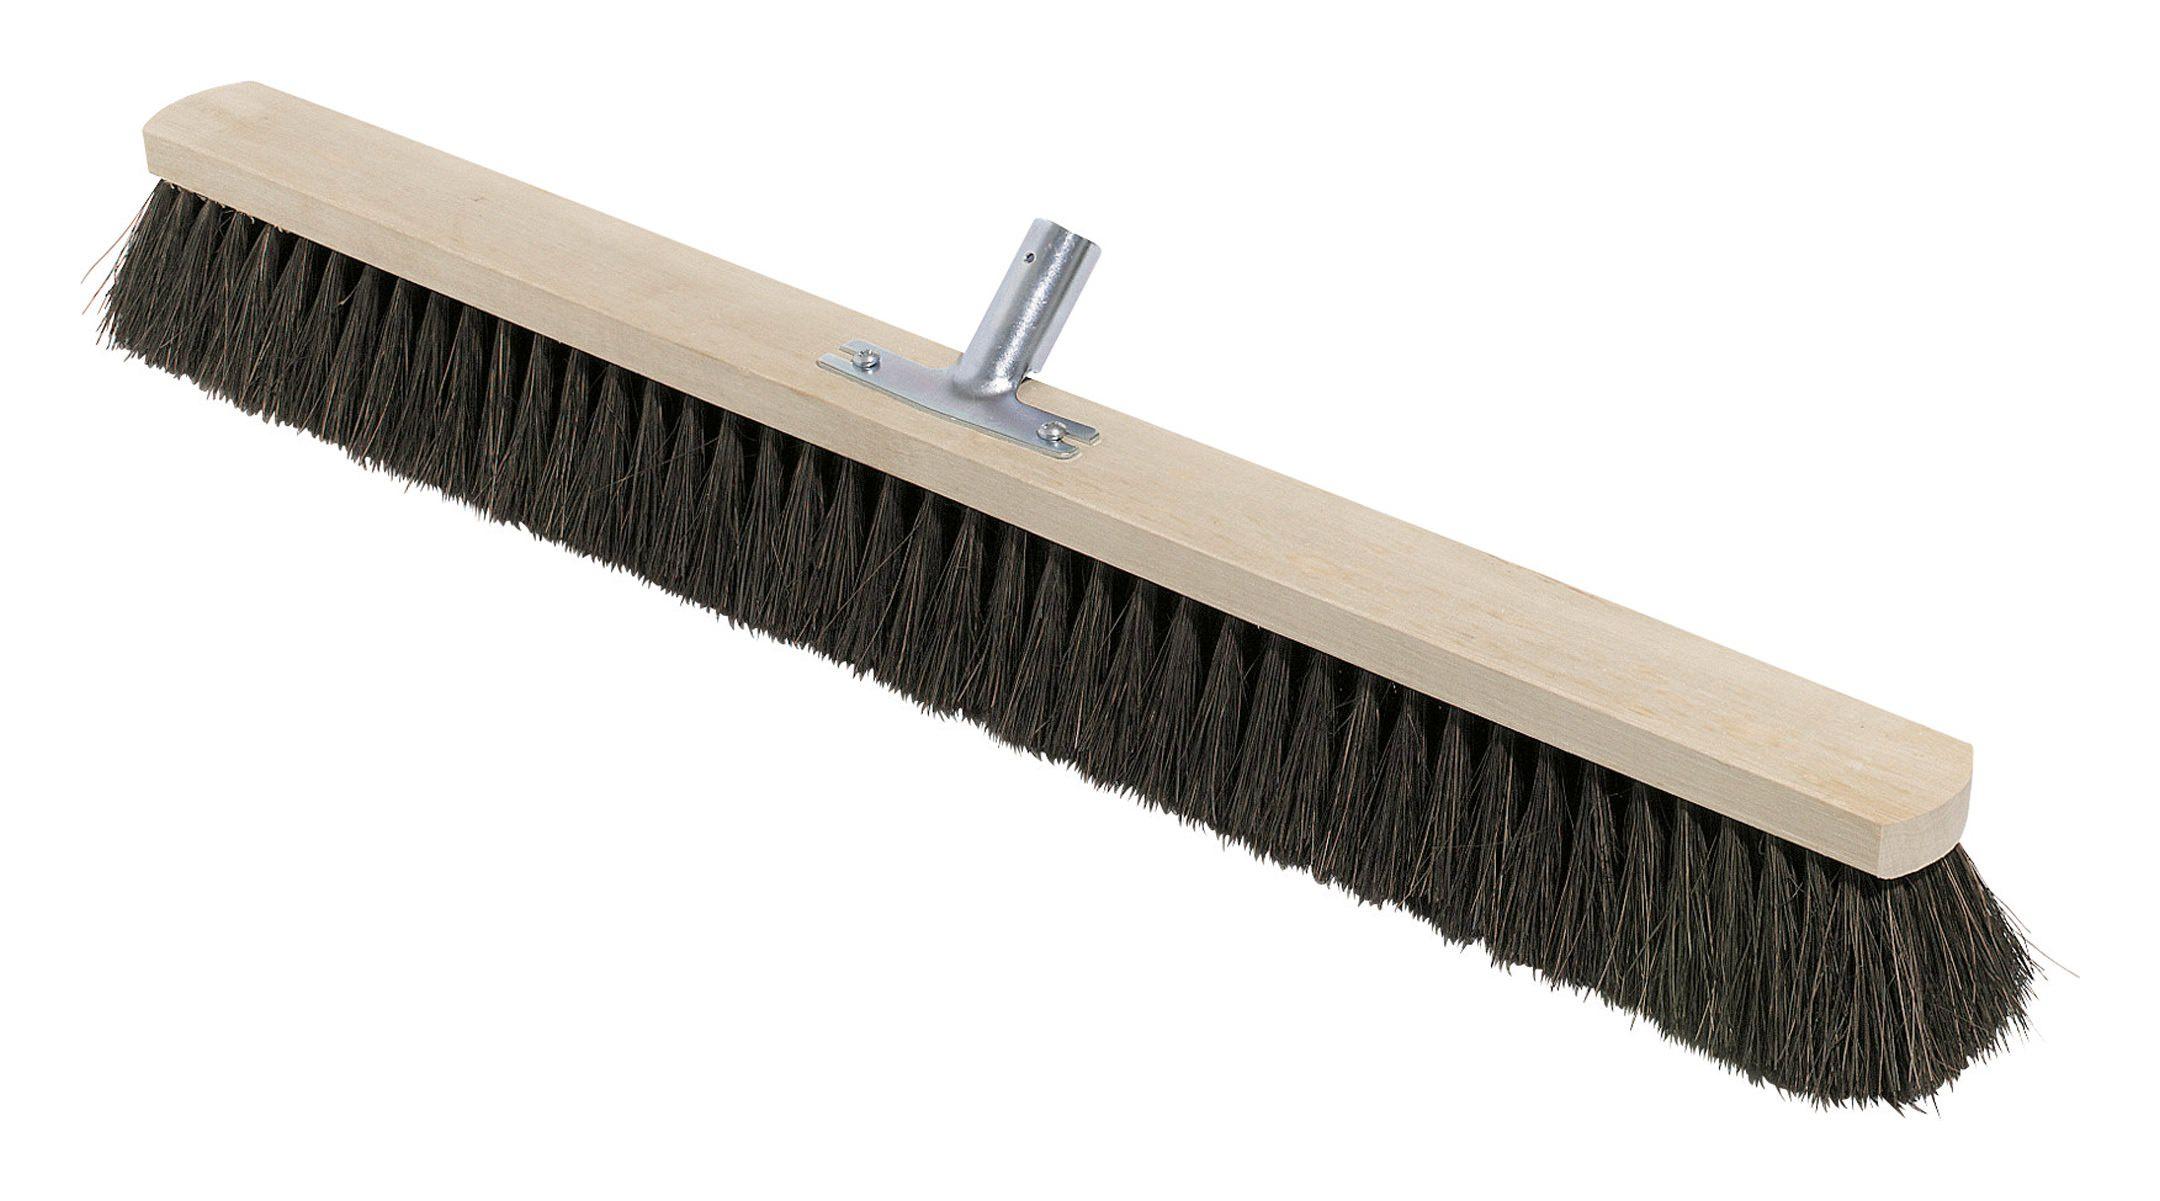 Saalbesen Arenga 60 cm mit Stielhalter - 2326.06